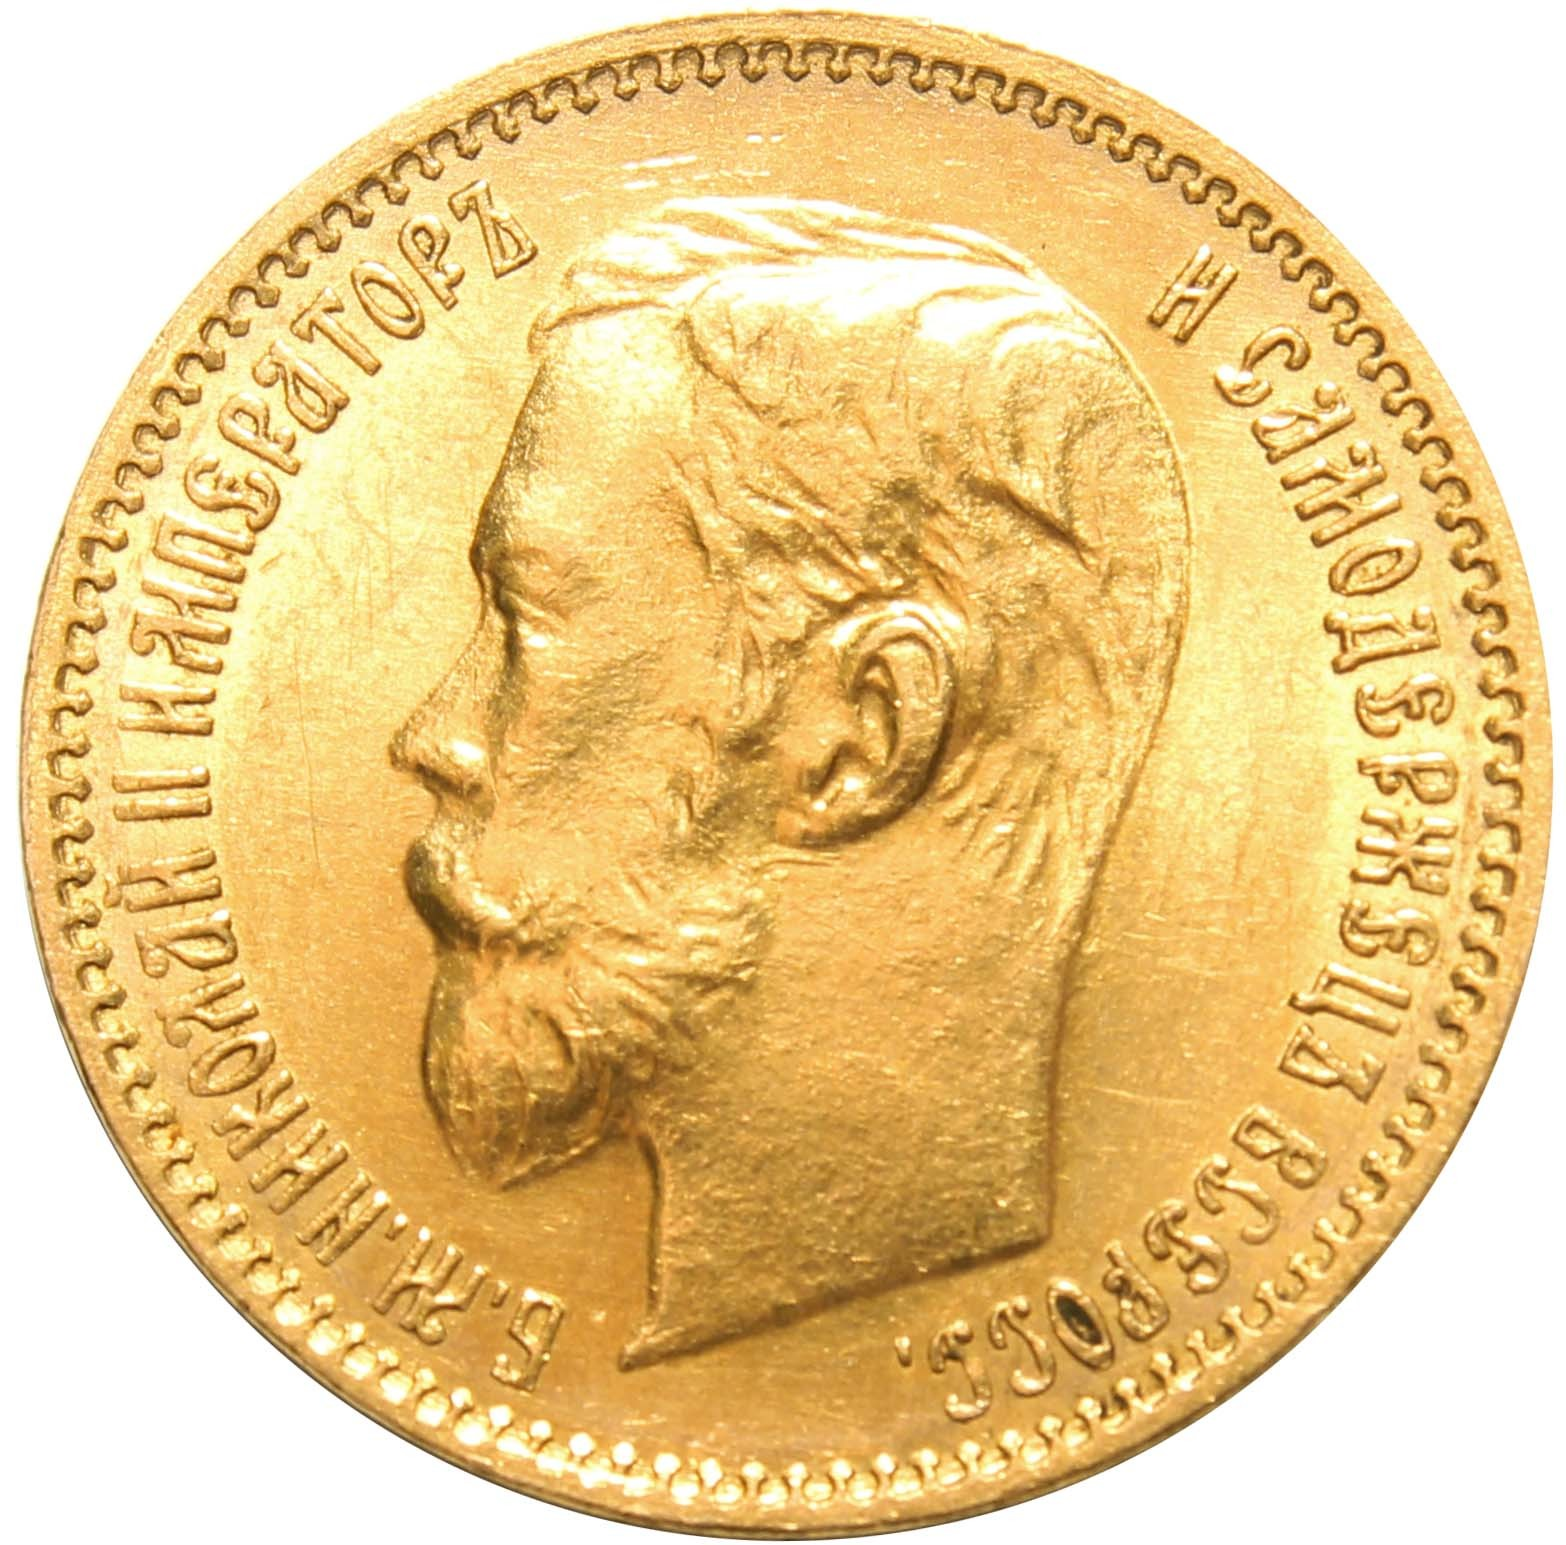 5 рублей 1902 г. (АР). Николай II XF